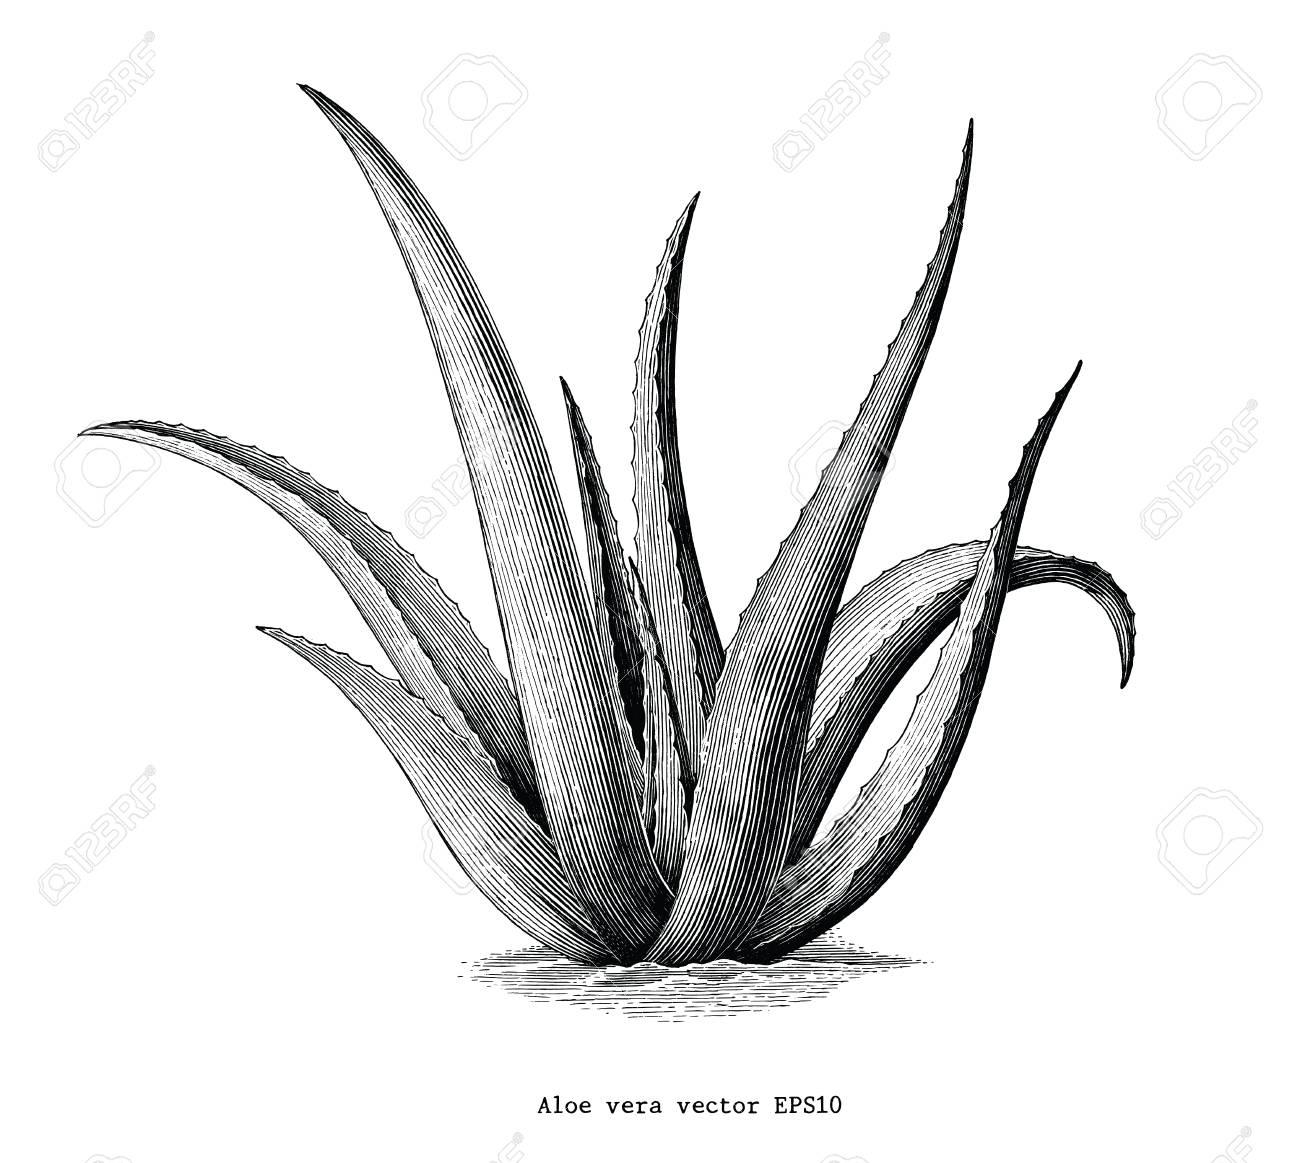 Aloe vera hand draw vintage botanical clip art isolated on white...